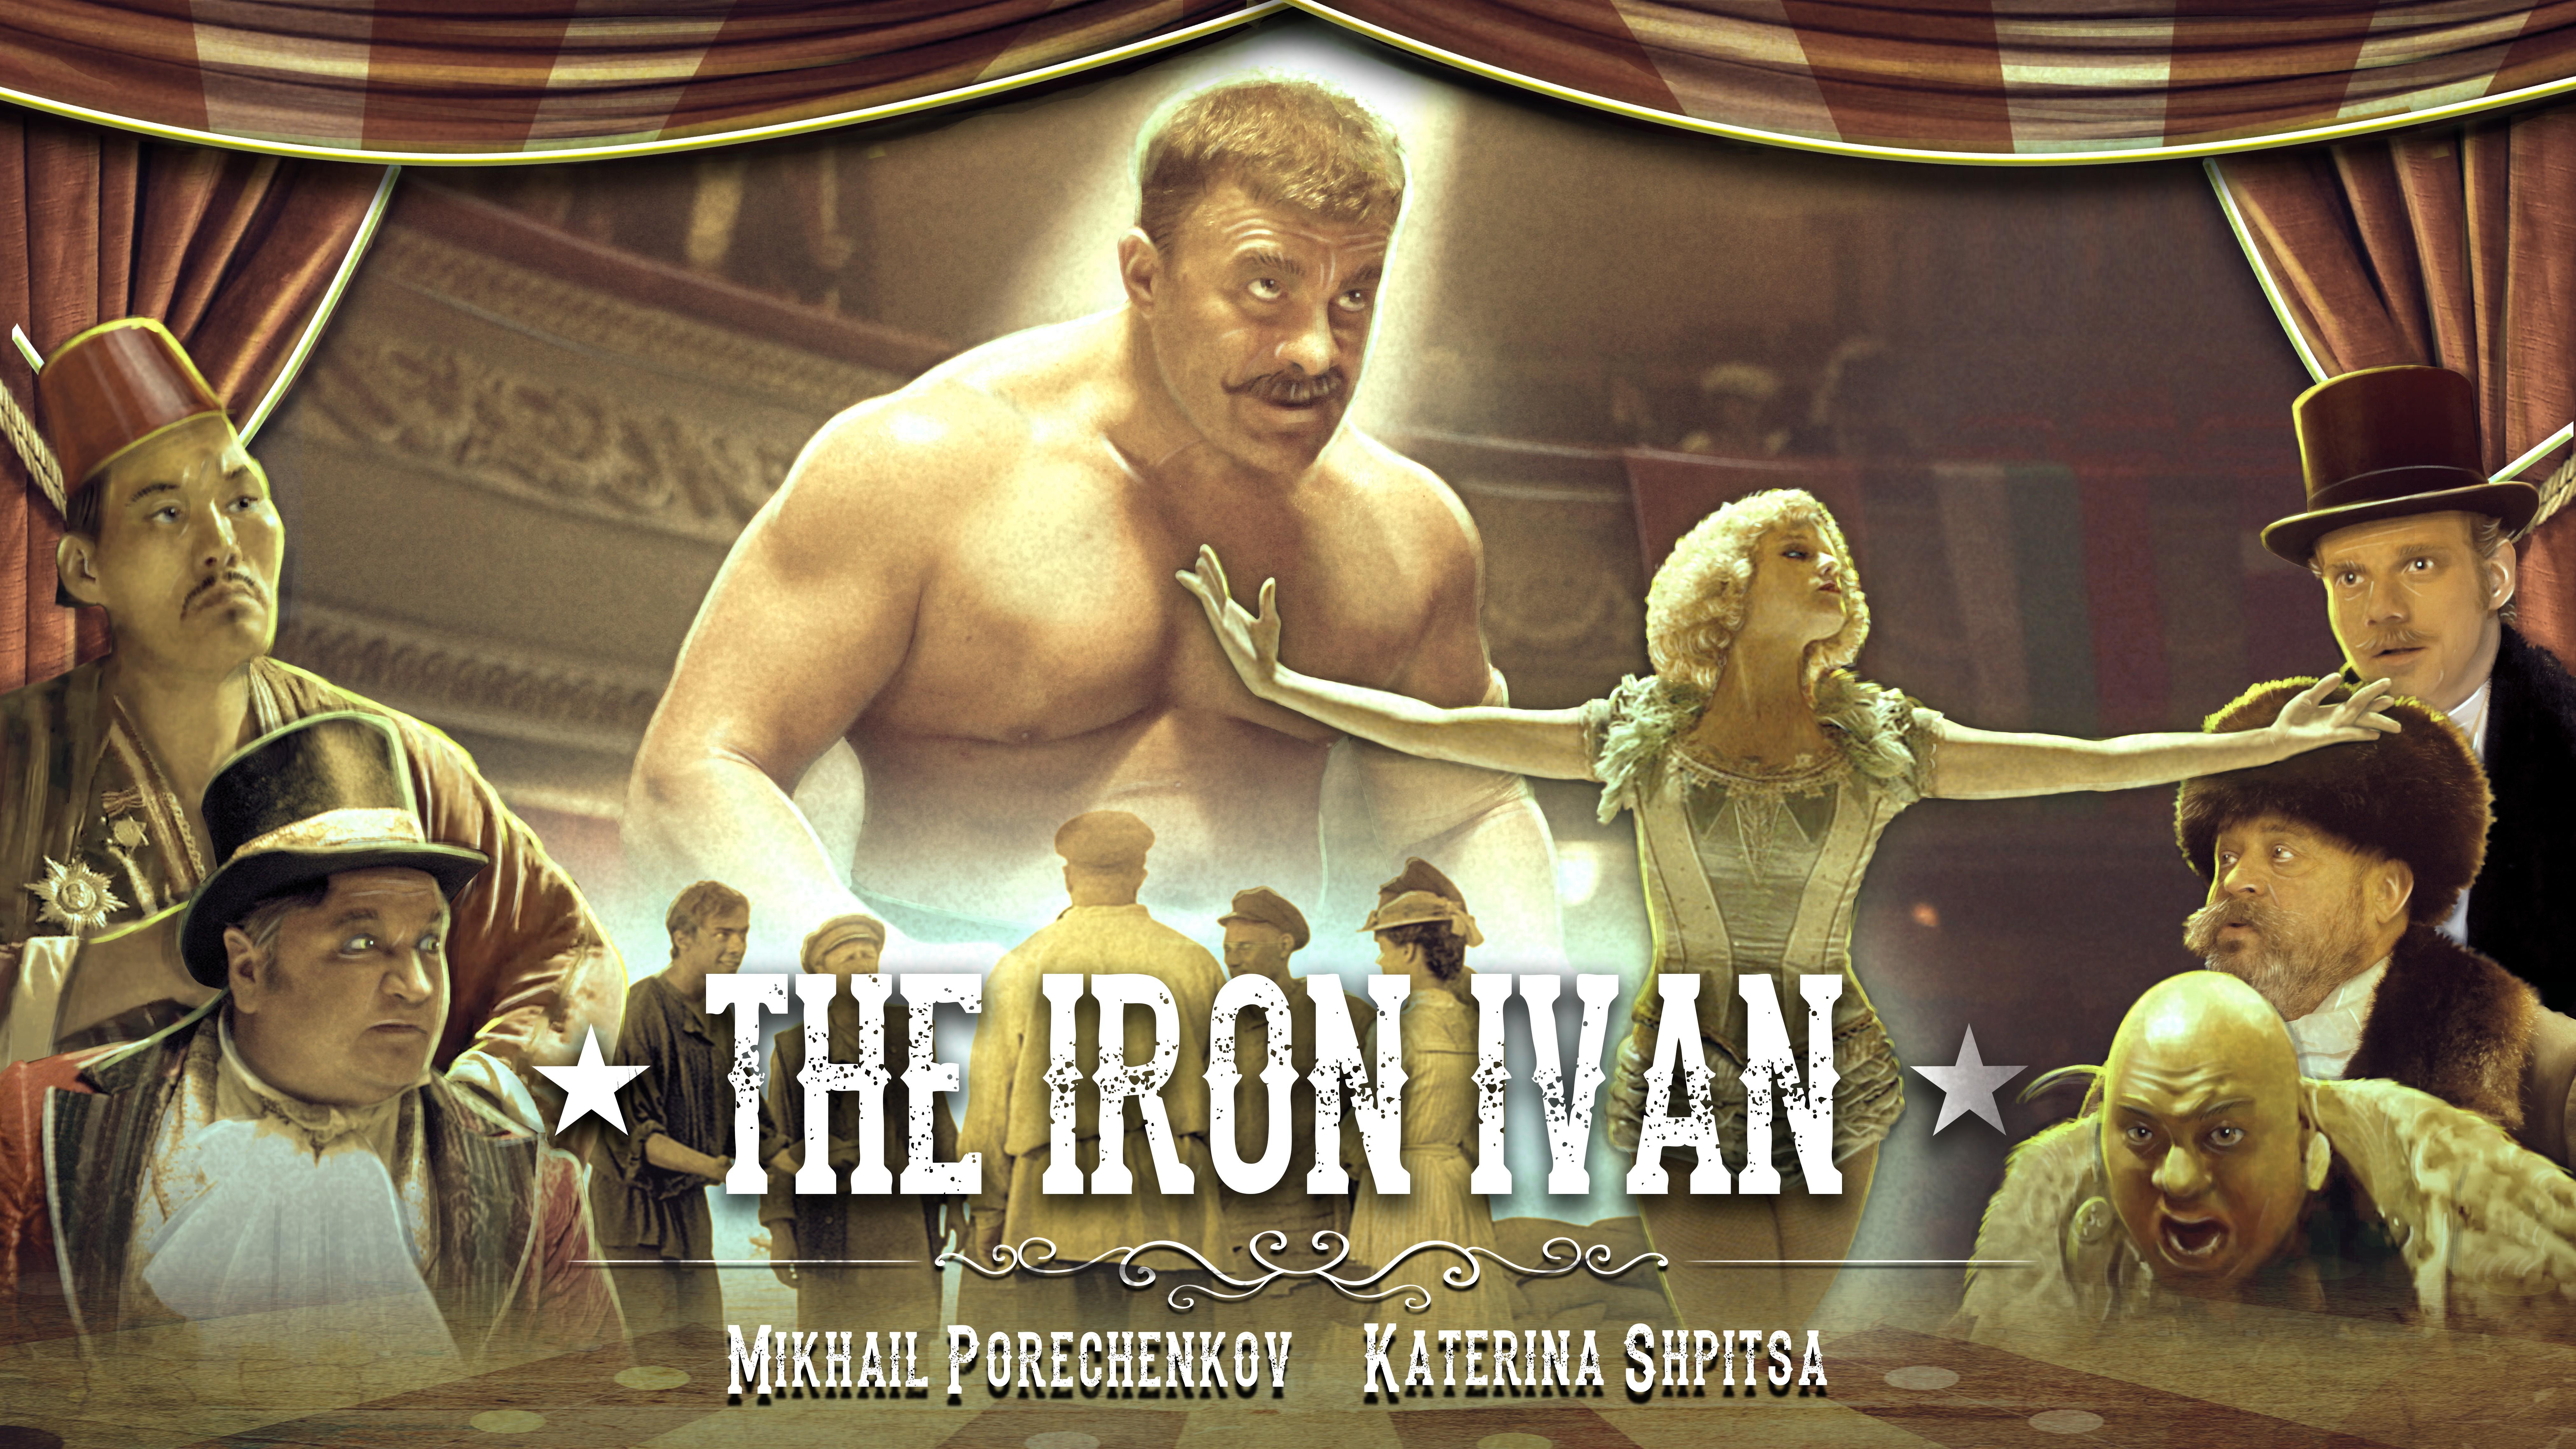 The Iron Ivan Poster Art